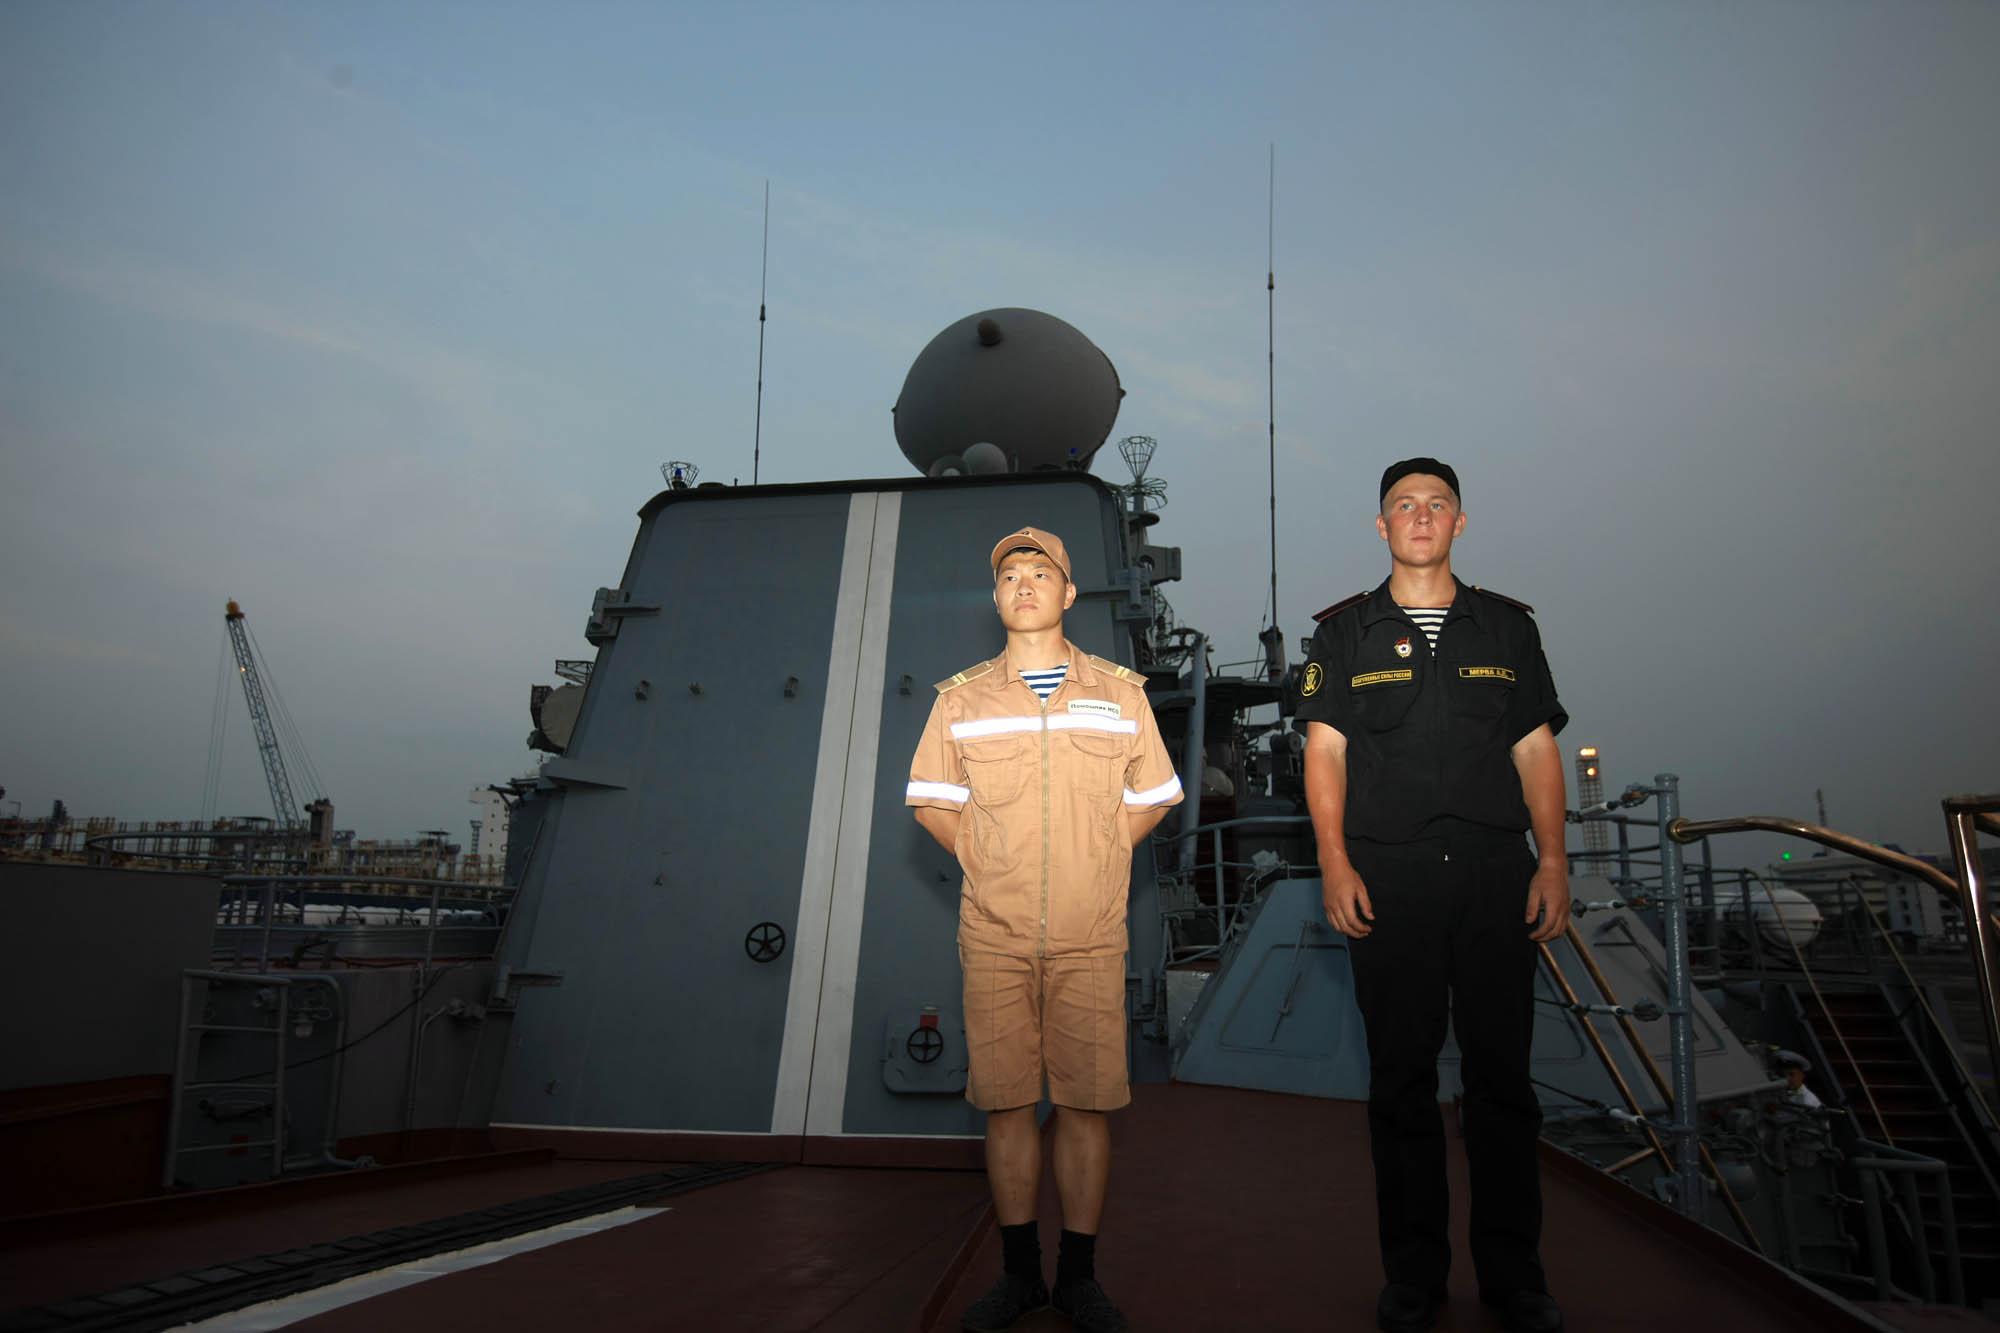 Dua orang awak kapal berjaga di kapal jelajah 'Varyag' yang tengah bersandar di Pelabuhan JICT 2, Tanjung Priok, Jakarta, Selasa (23/5). Pada Kamis (25/5), kru kapal berencana menggelar latihan gabungan di bidang komunikasi dan taktis dengan TNI-AL.